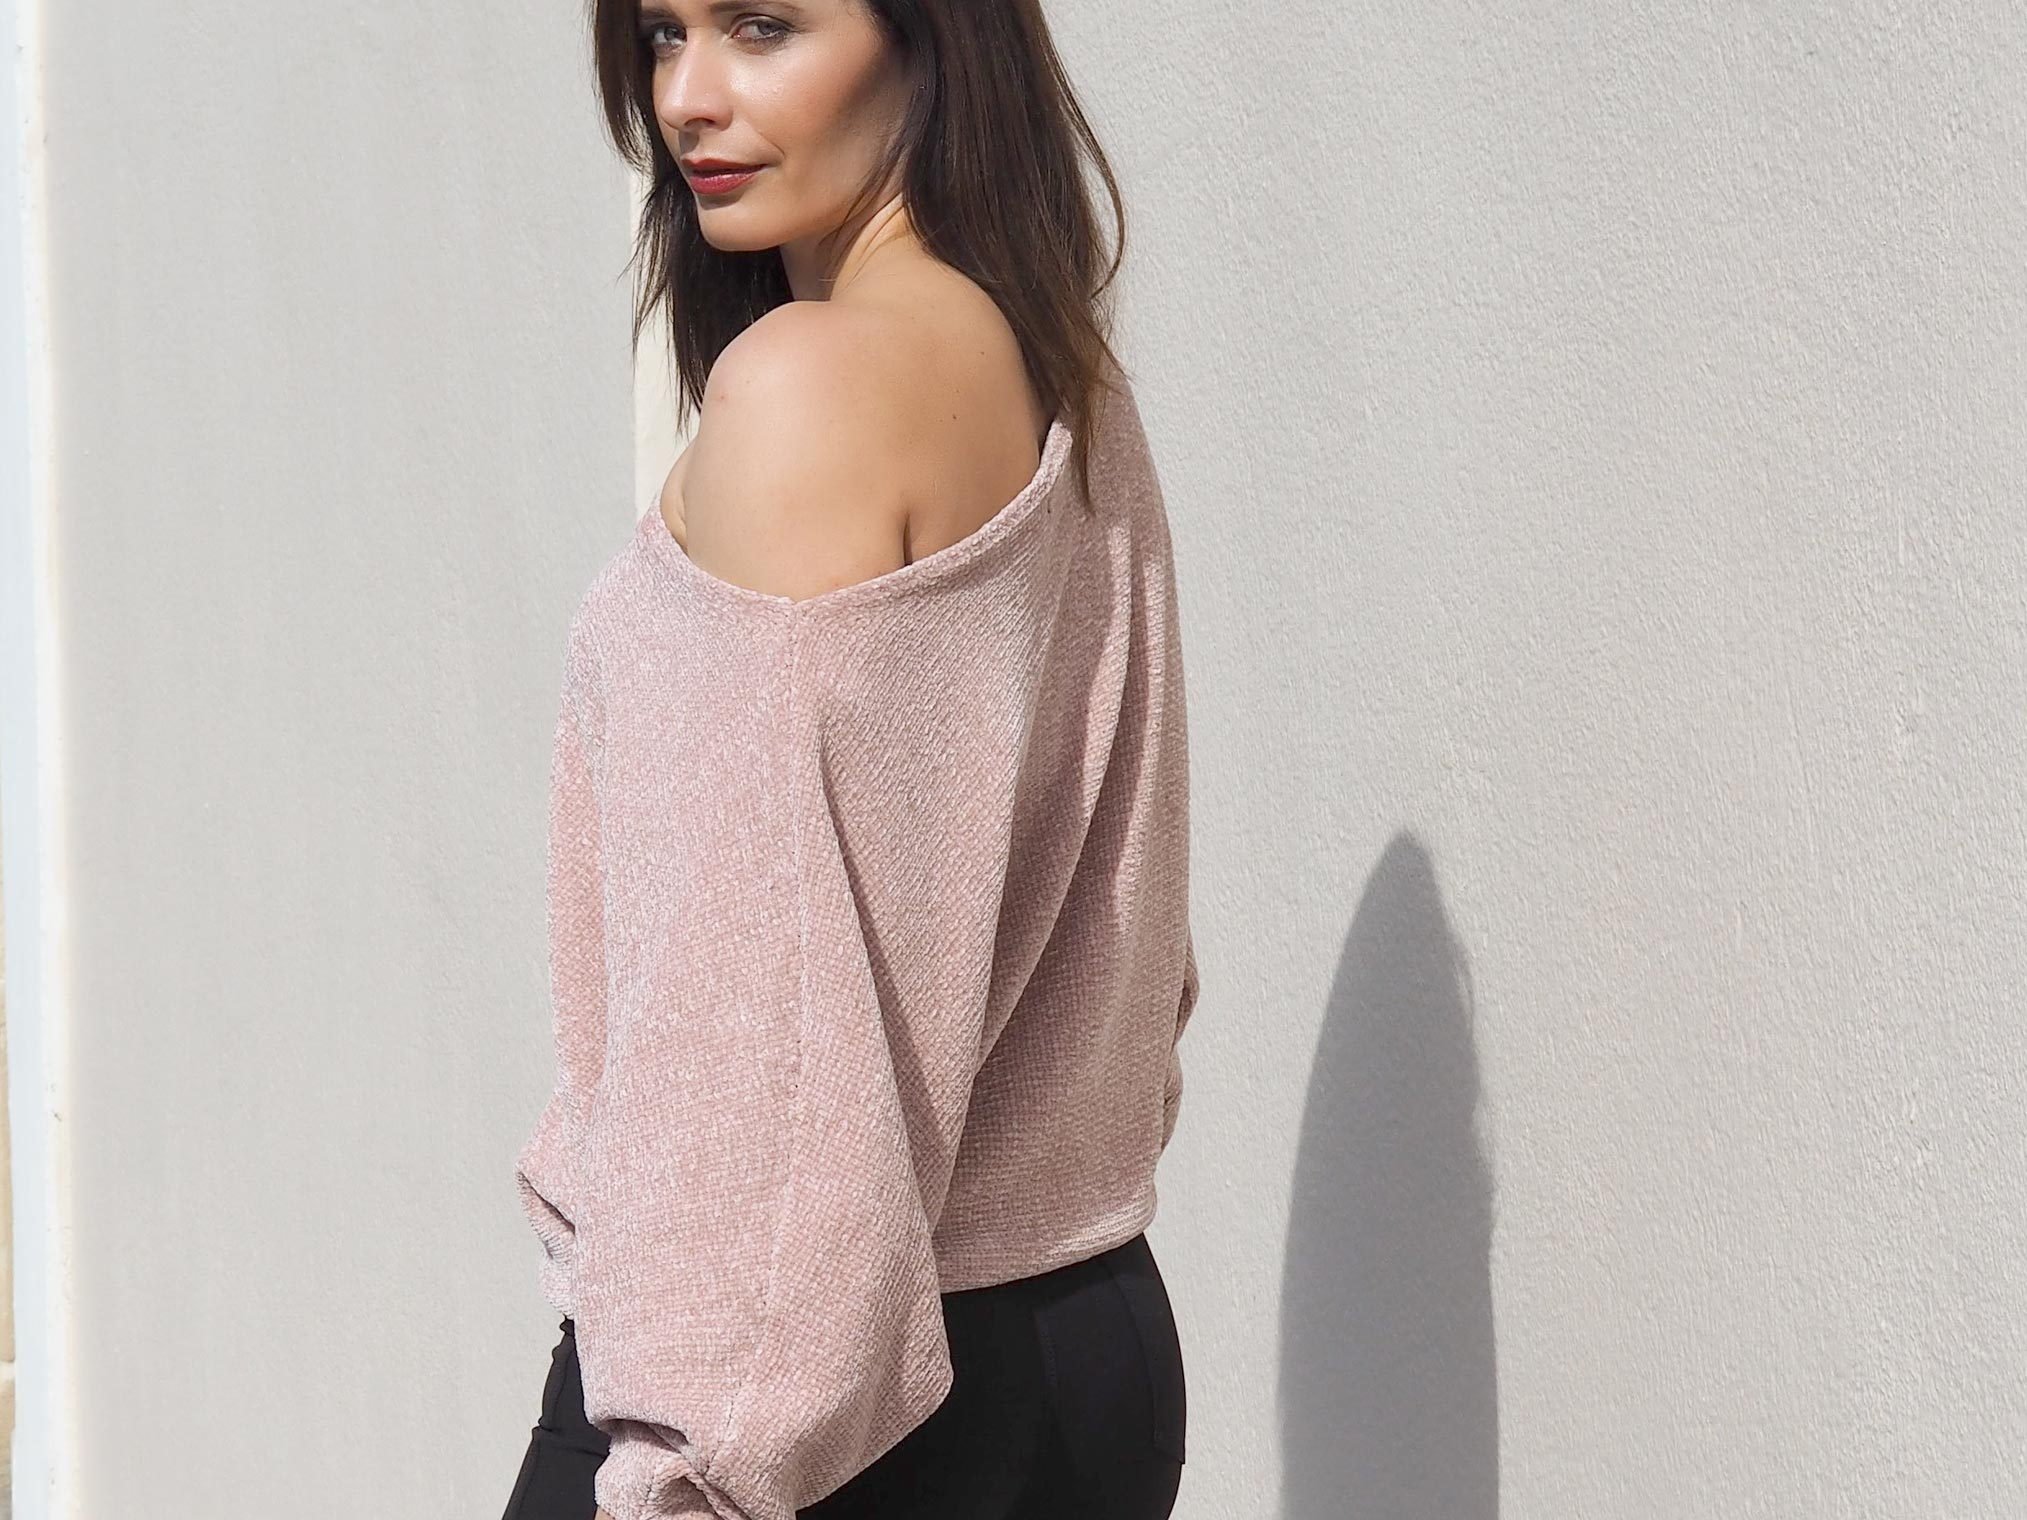 Zara pink sweater off the shoulder autumn trend